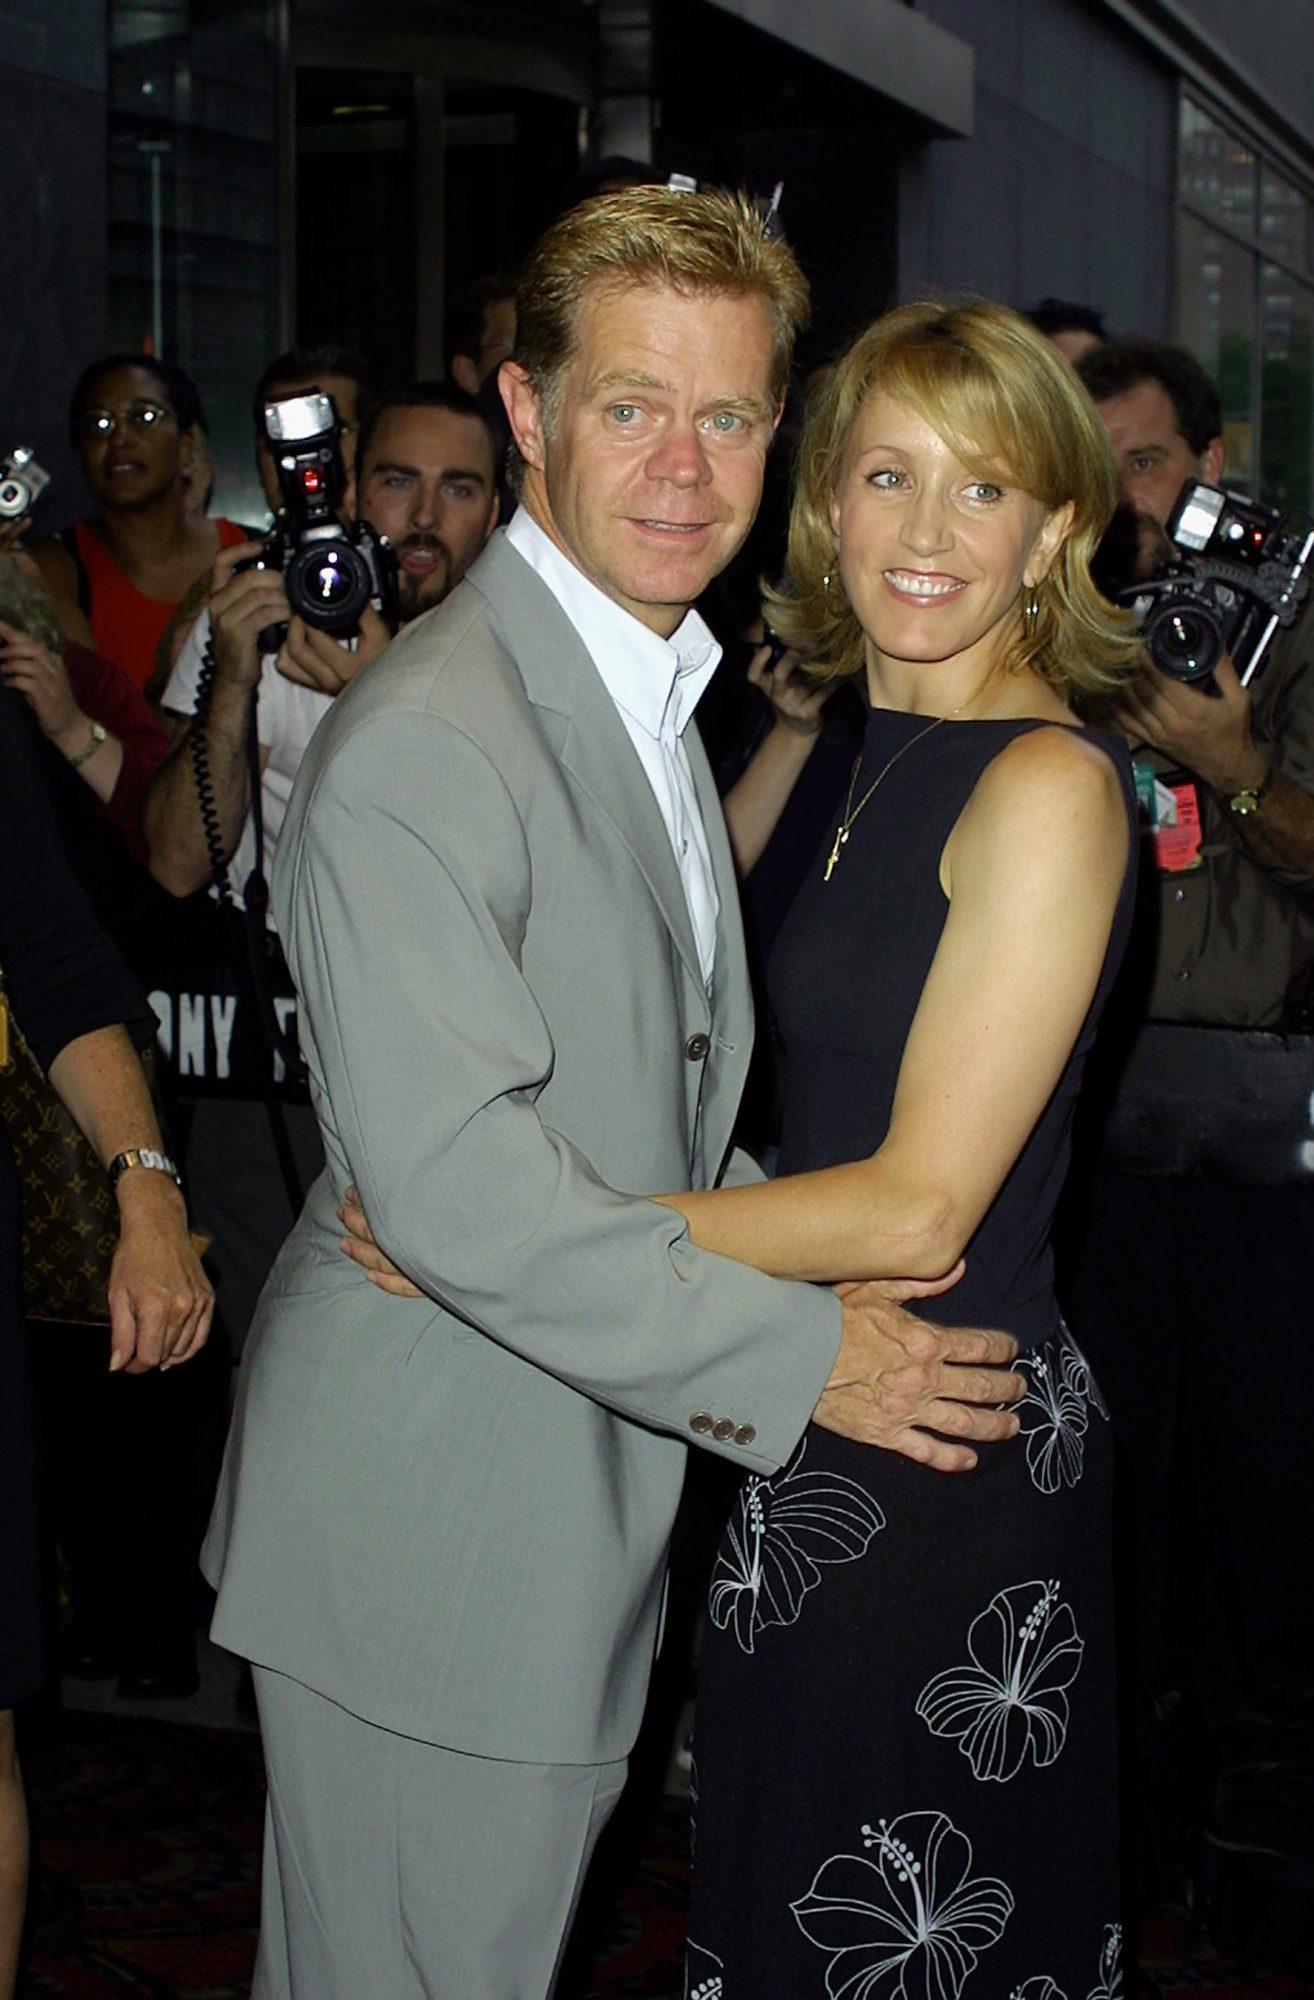 """Jurassic Park 3"" New York Premiere - July 7, 2001"